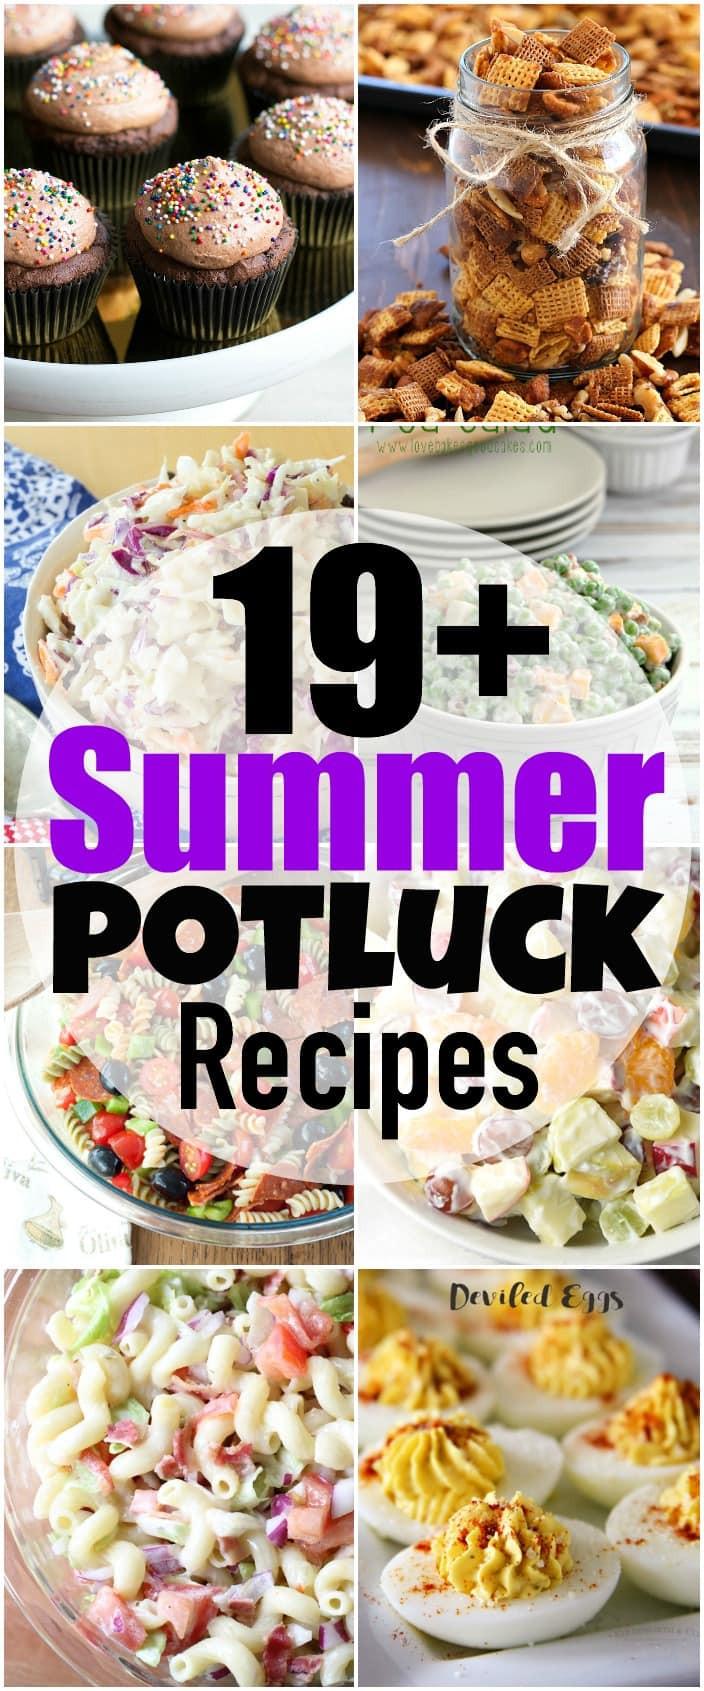 Summer Potluck Desserts  19 Summer Potluck Recipes Yummy Healthy Easy